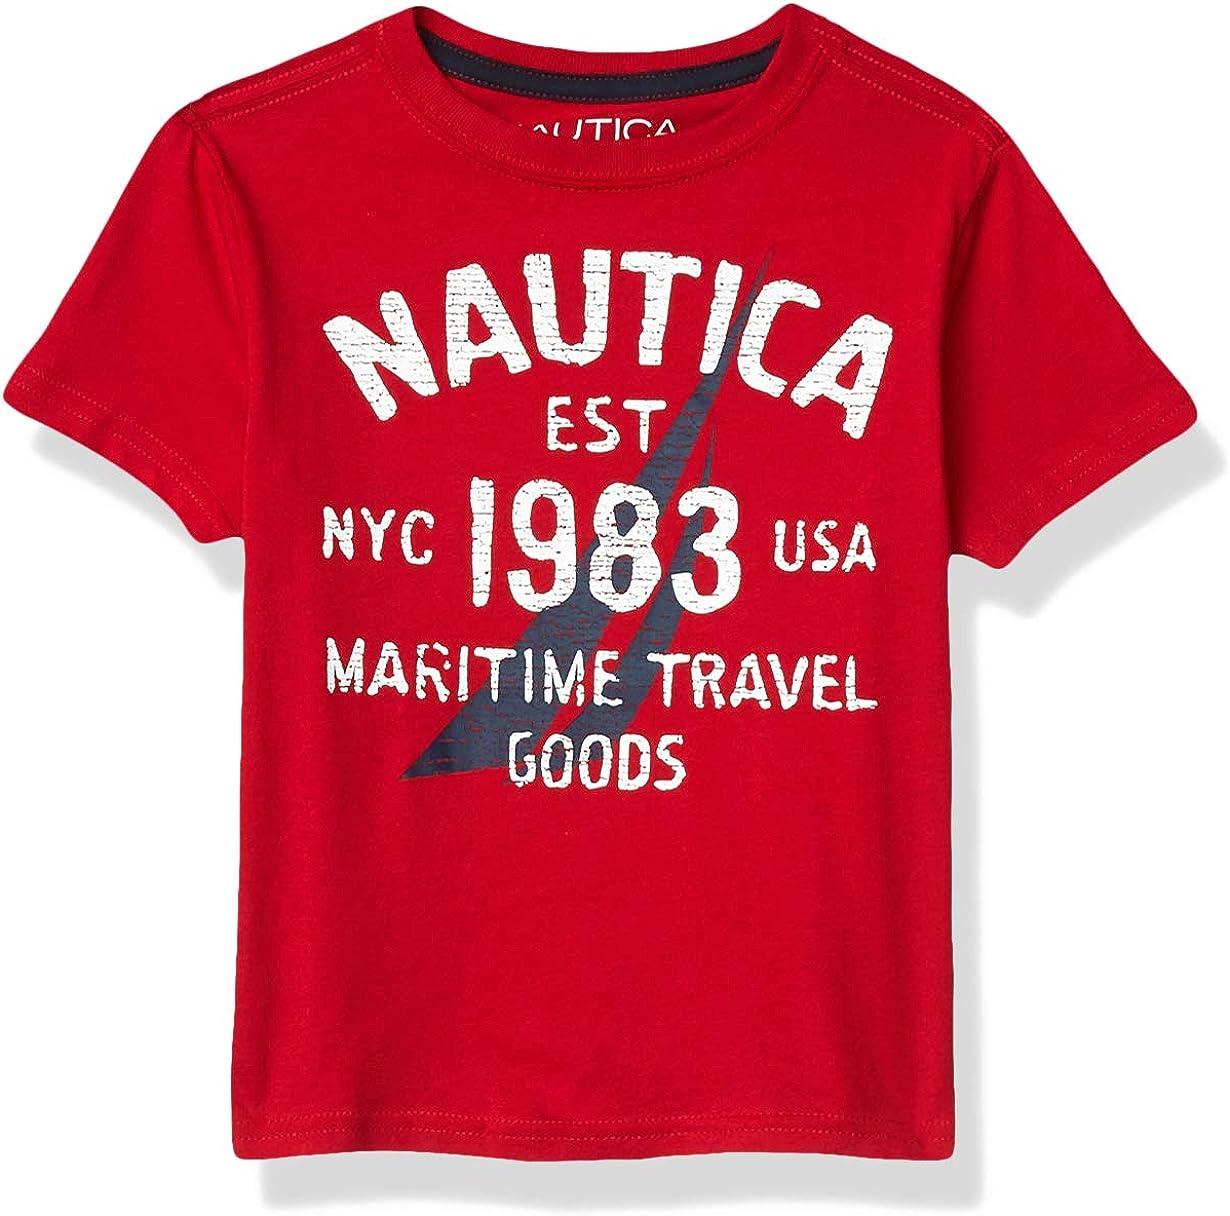 Nautica Boys' Short Sleeve Screenprint Curved Hem Crew Neck T-Shirt